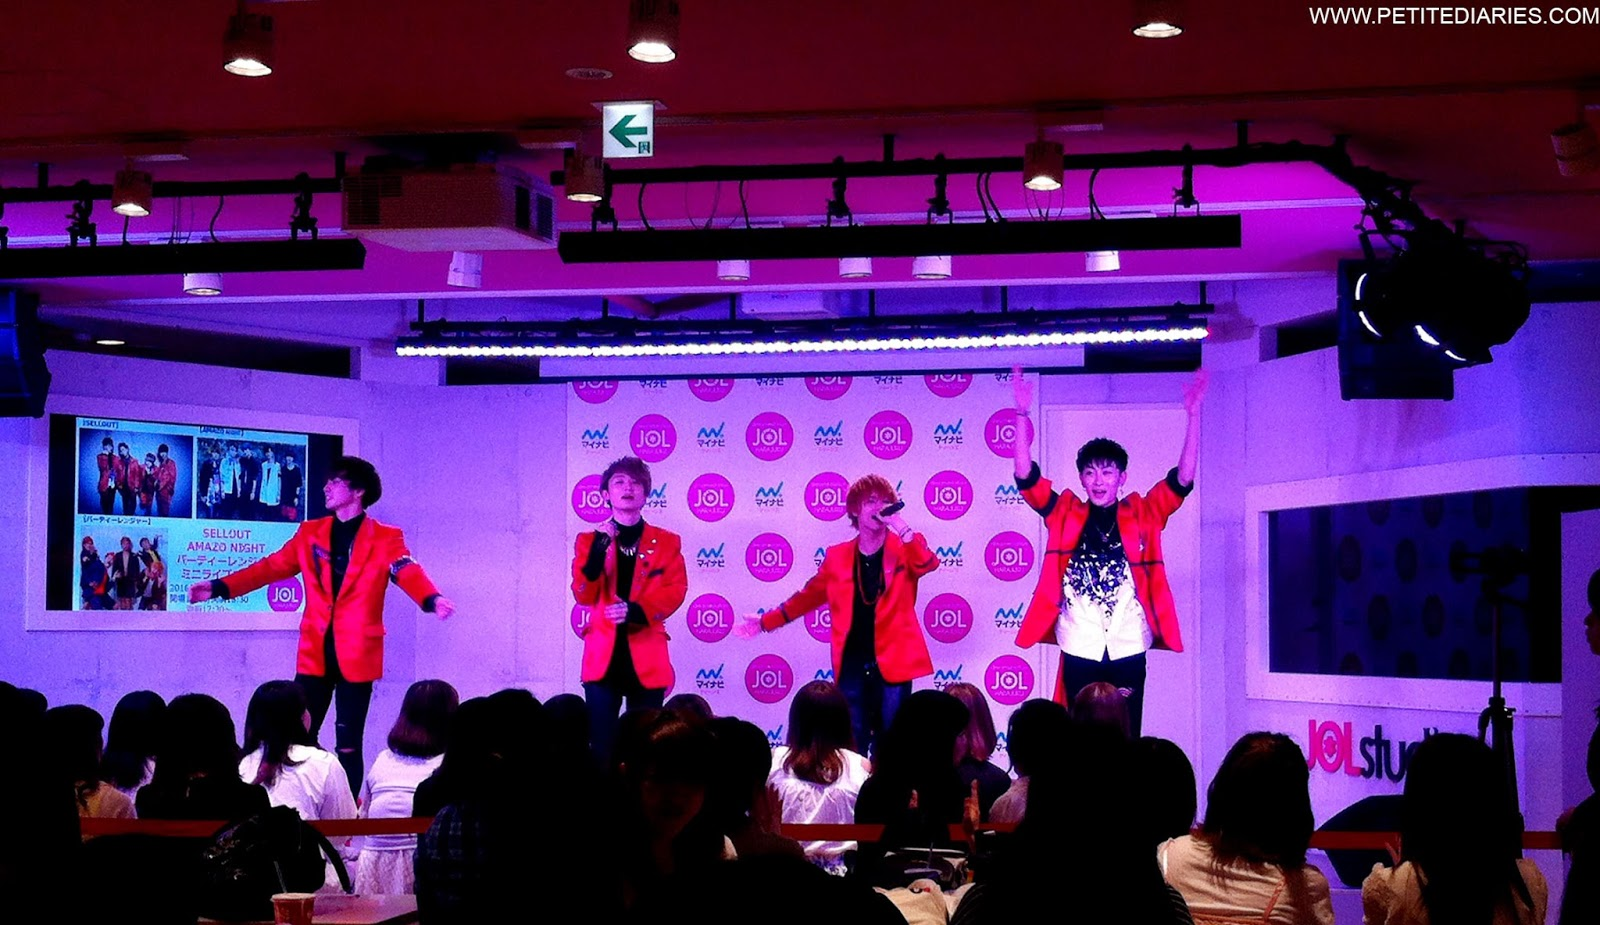 harajuku concert japanese boyband